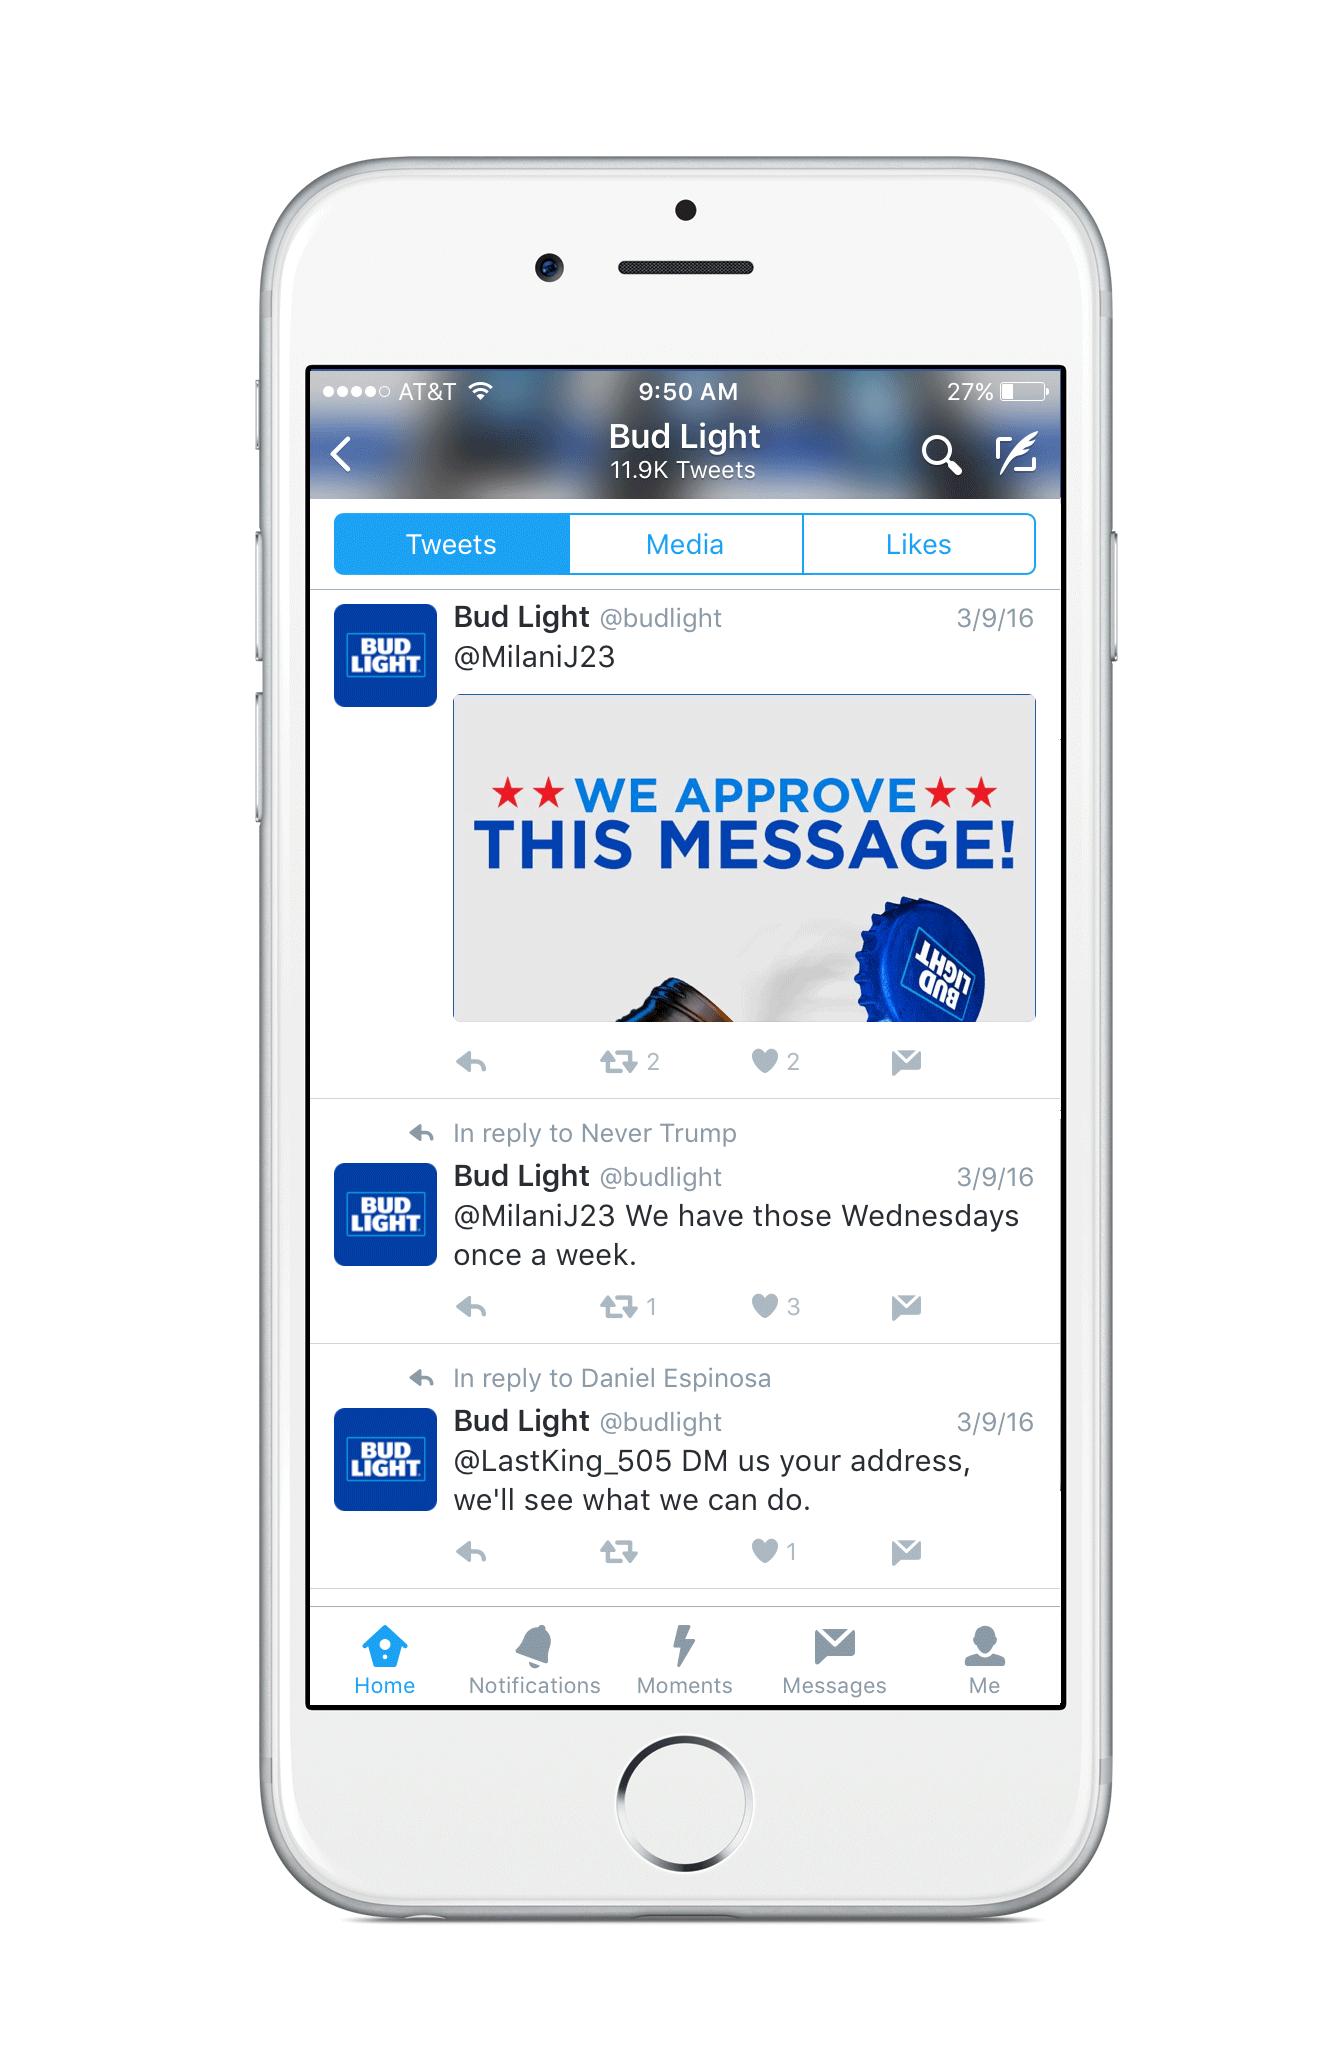 BLP_SocialUpdates_0002_Tweet-Response-2.png